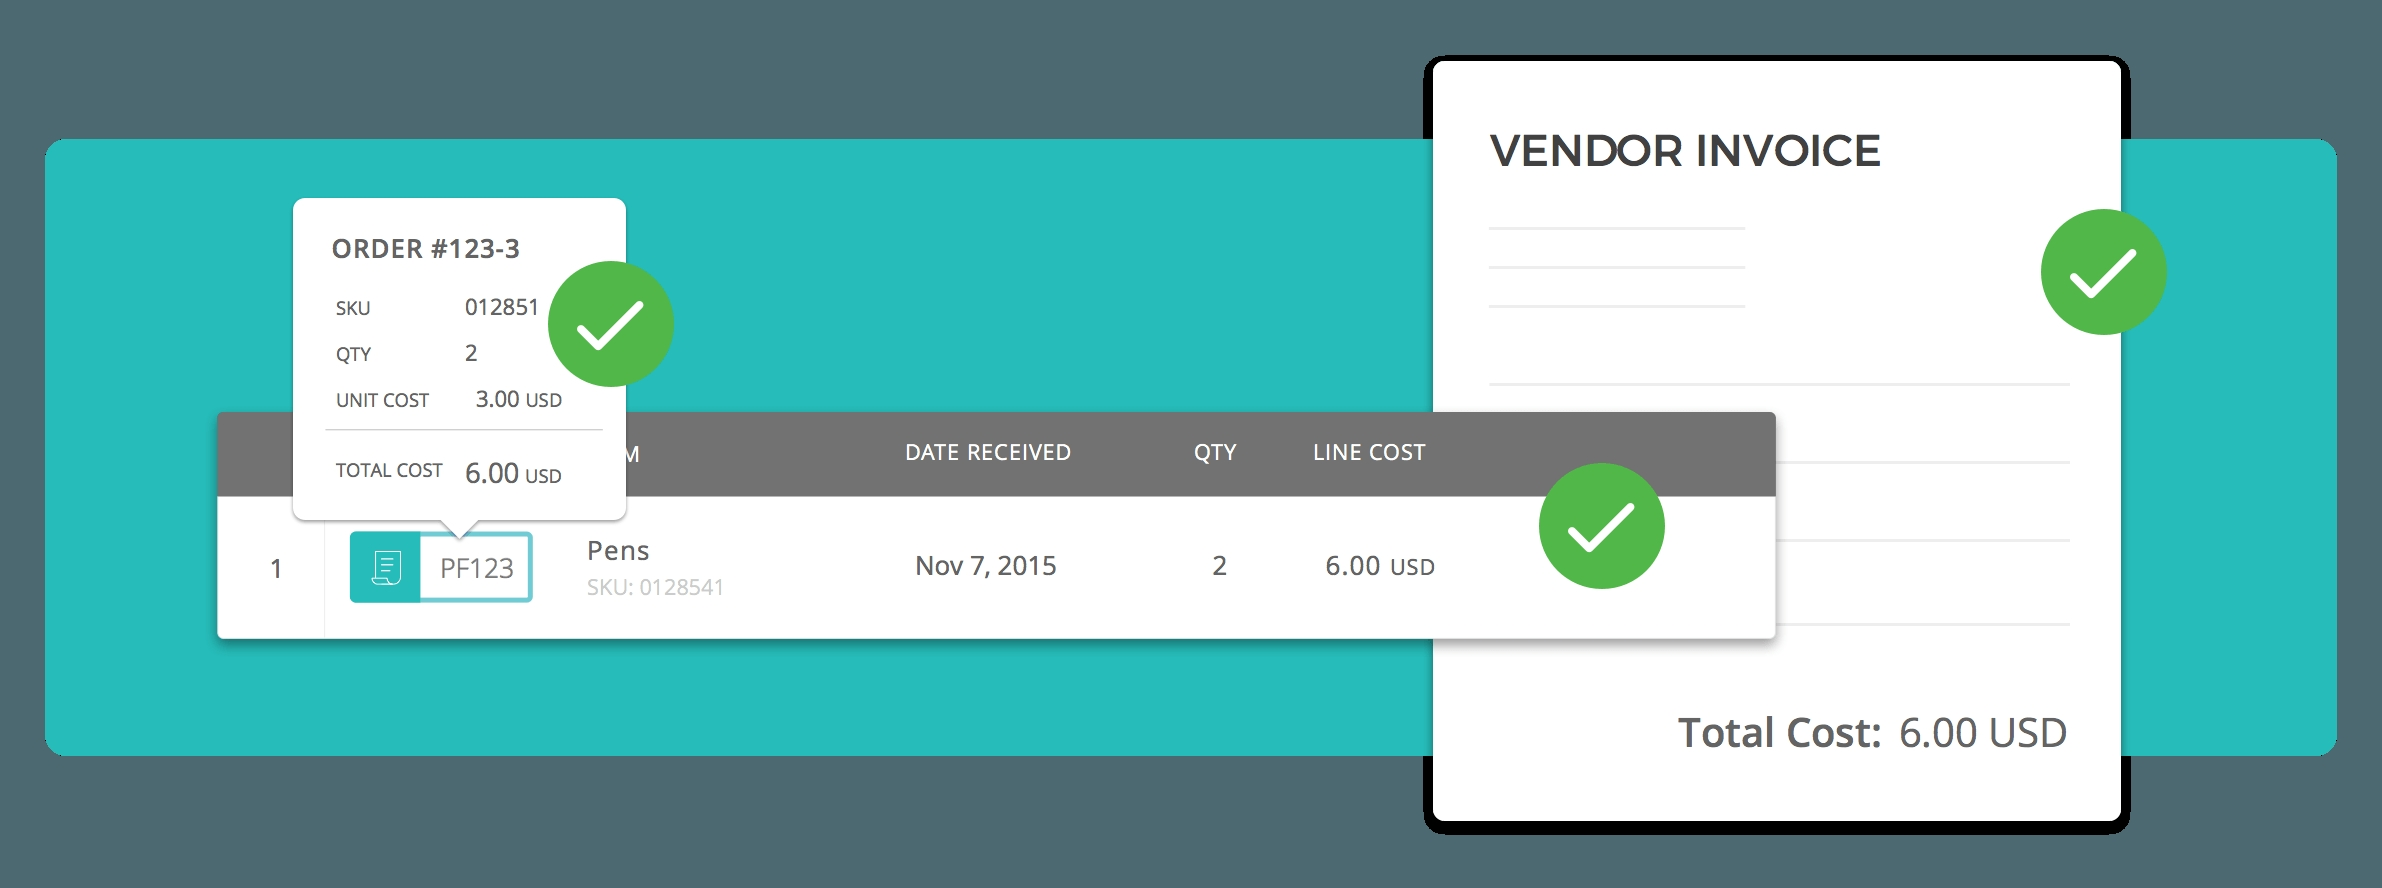 next generation accounts payable software procurify invoice 3 way match